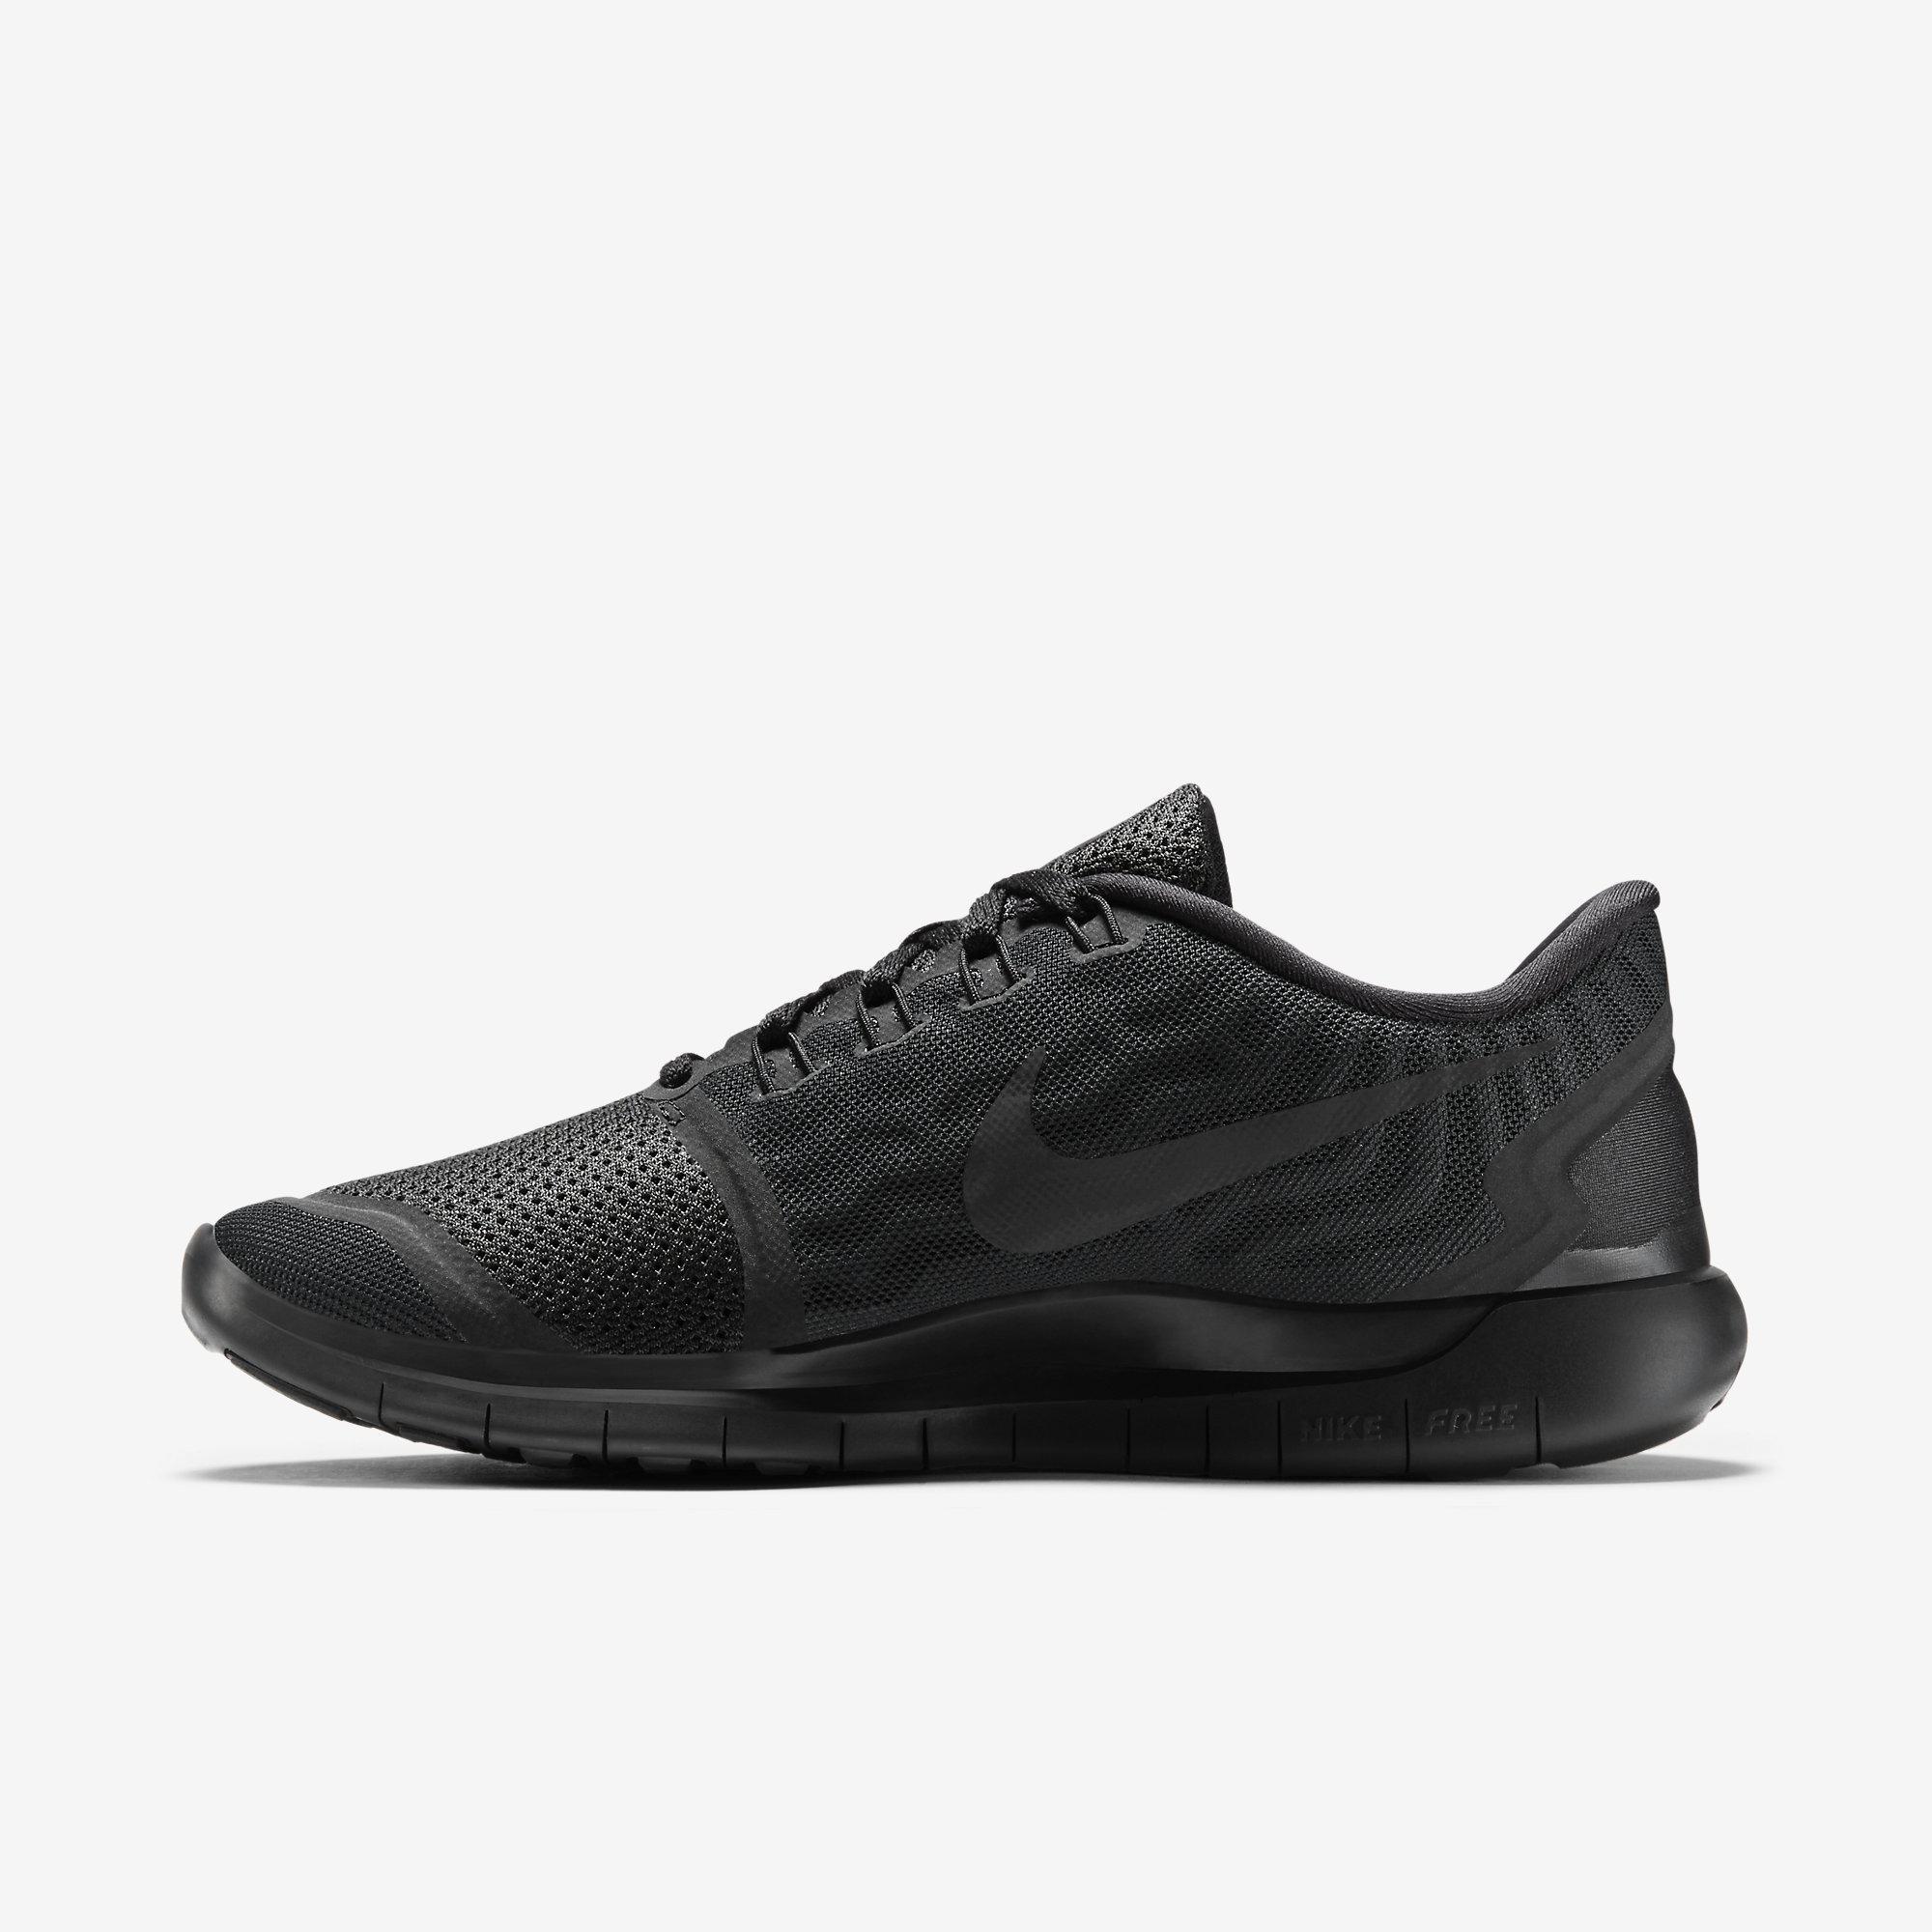 Womens Nike Running Shoes Black